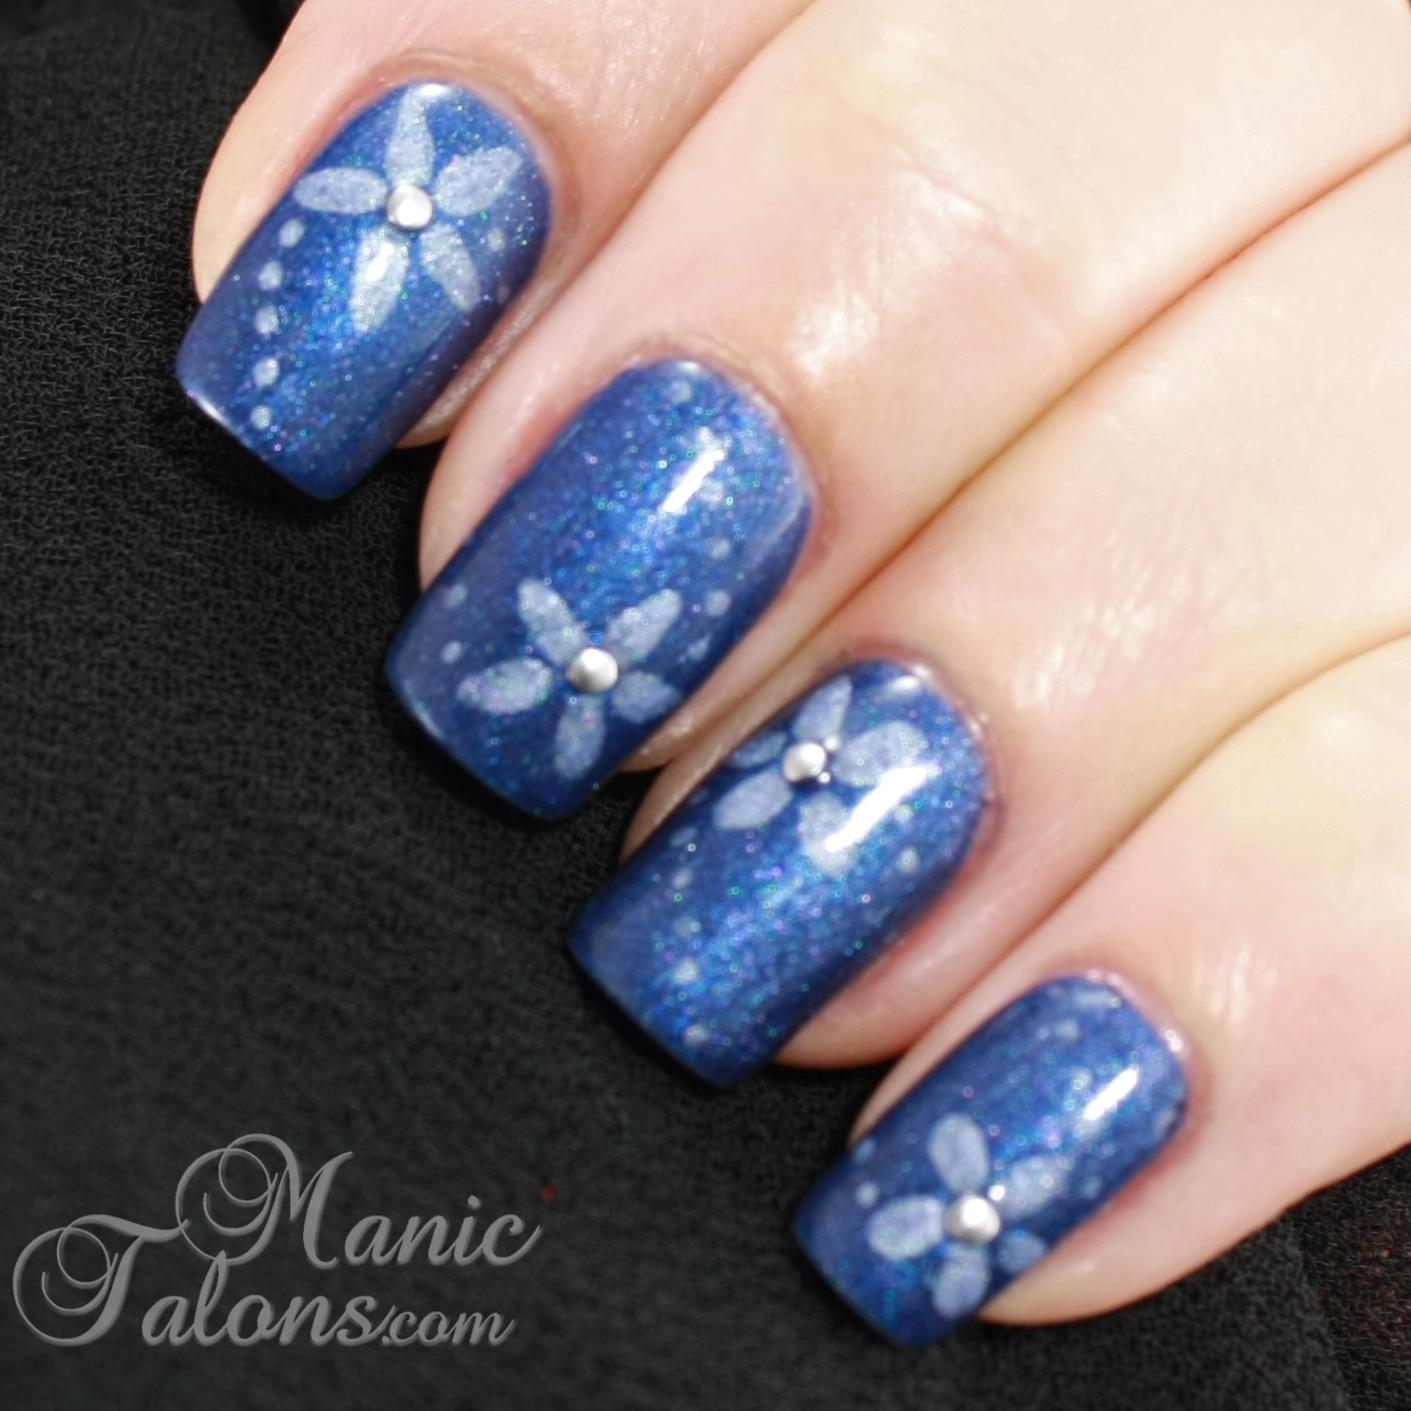 Simple Blue Flowers Nail Art